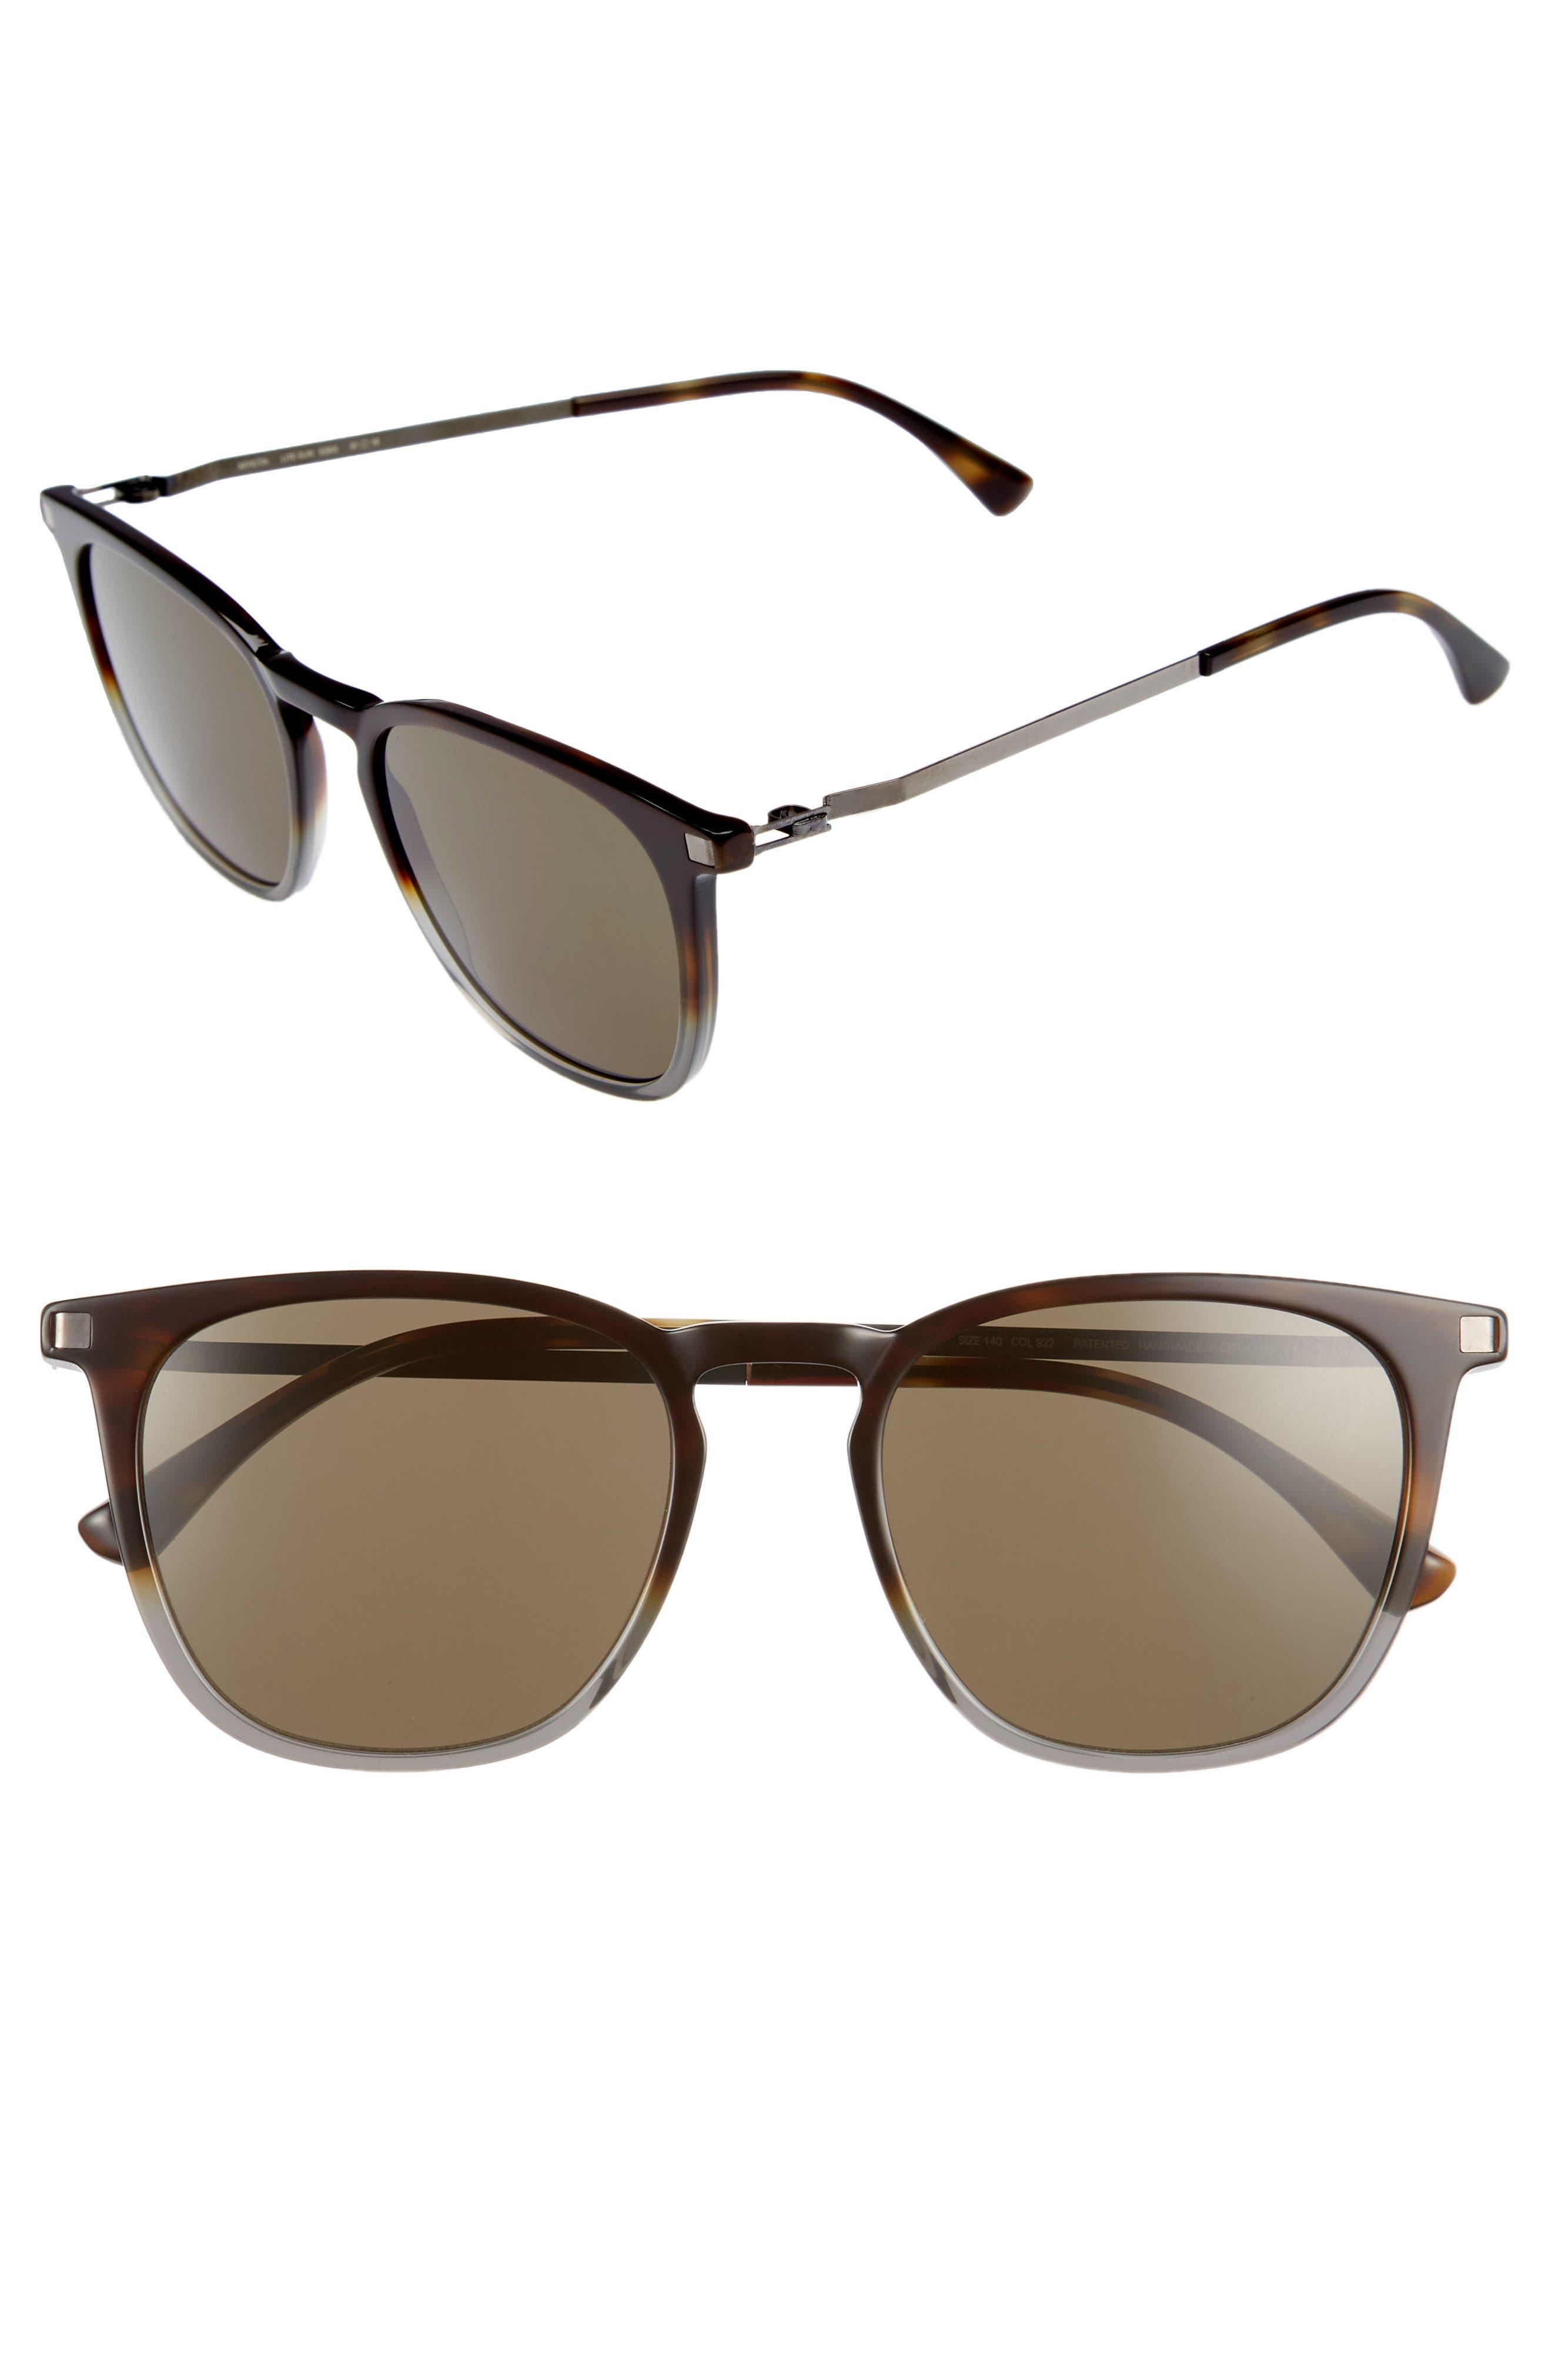 Eska 51mm Sunglasses,                         Main,                         color, Santiago Gradient/ Graphite